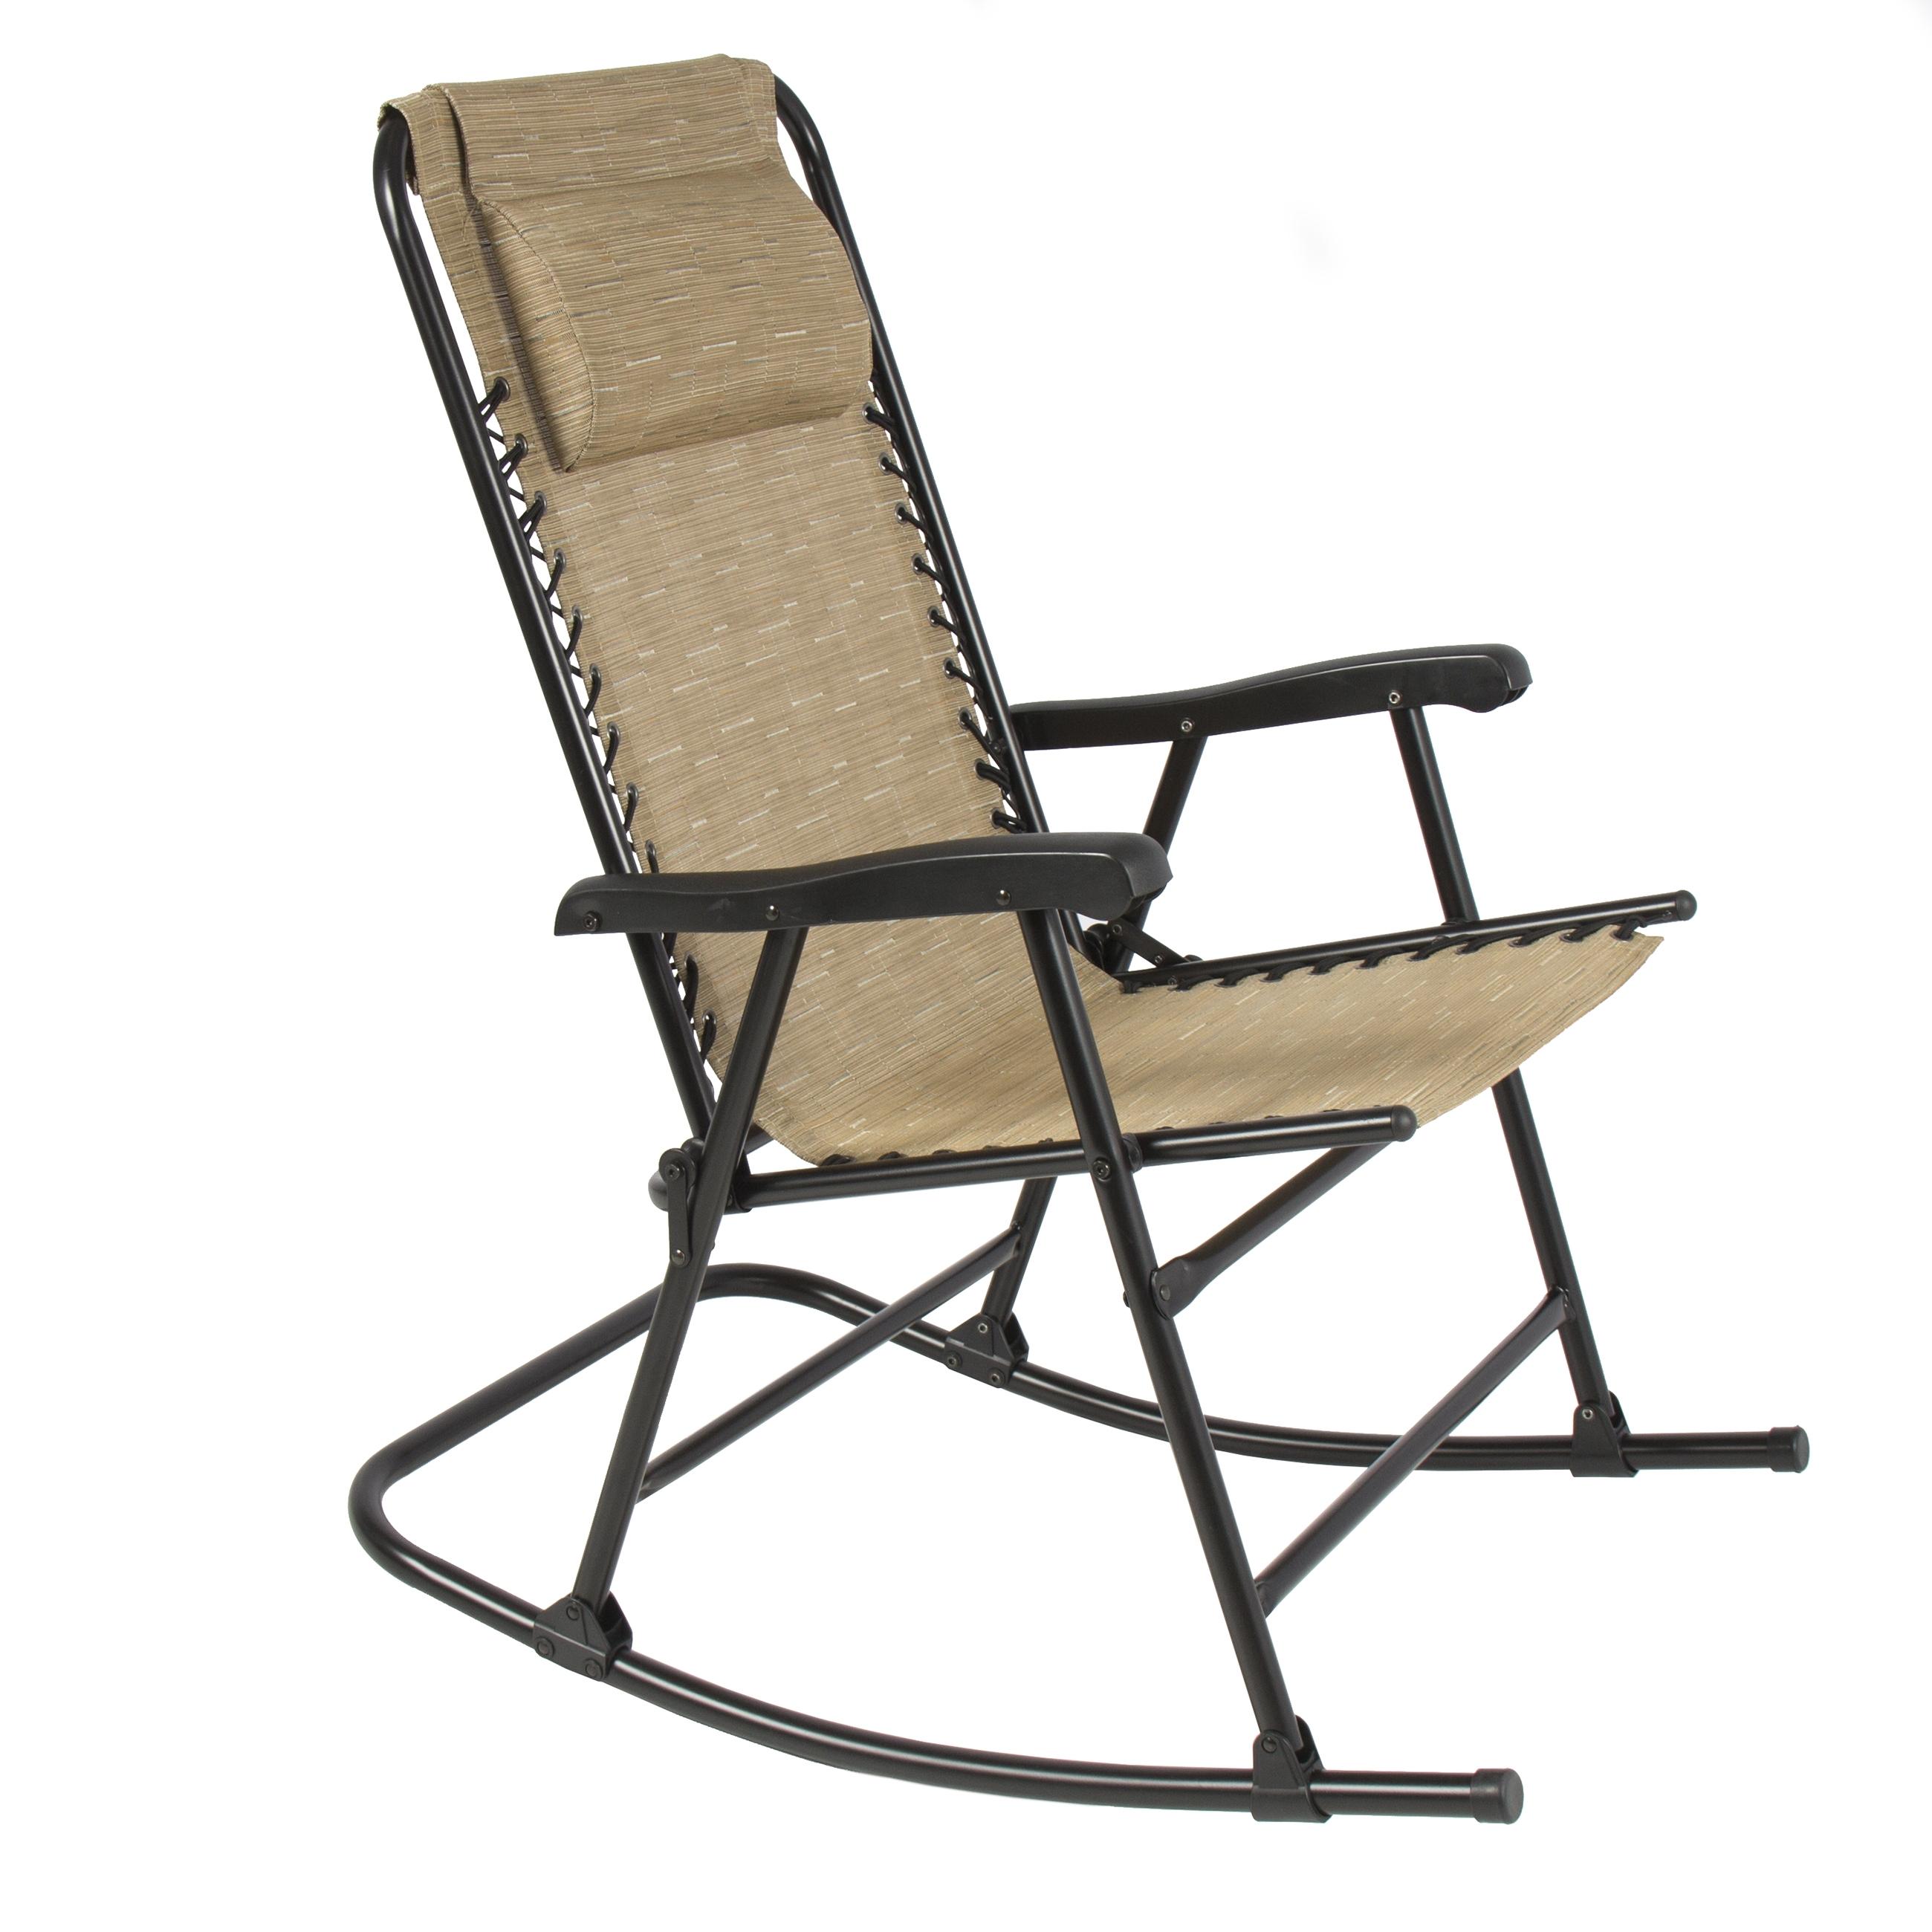 Latest Rocking Chairs At Walmart Regarding Folding Rocking Chair Foldable Rocker Outdoor Patio Furniture Beige (View 4 of 20)